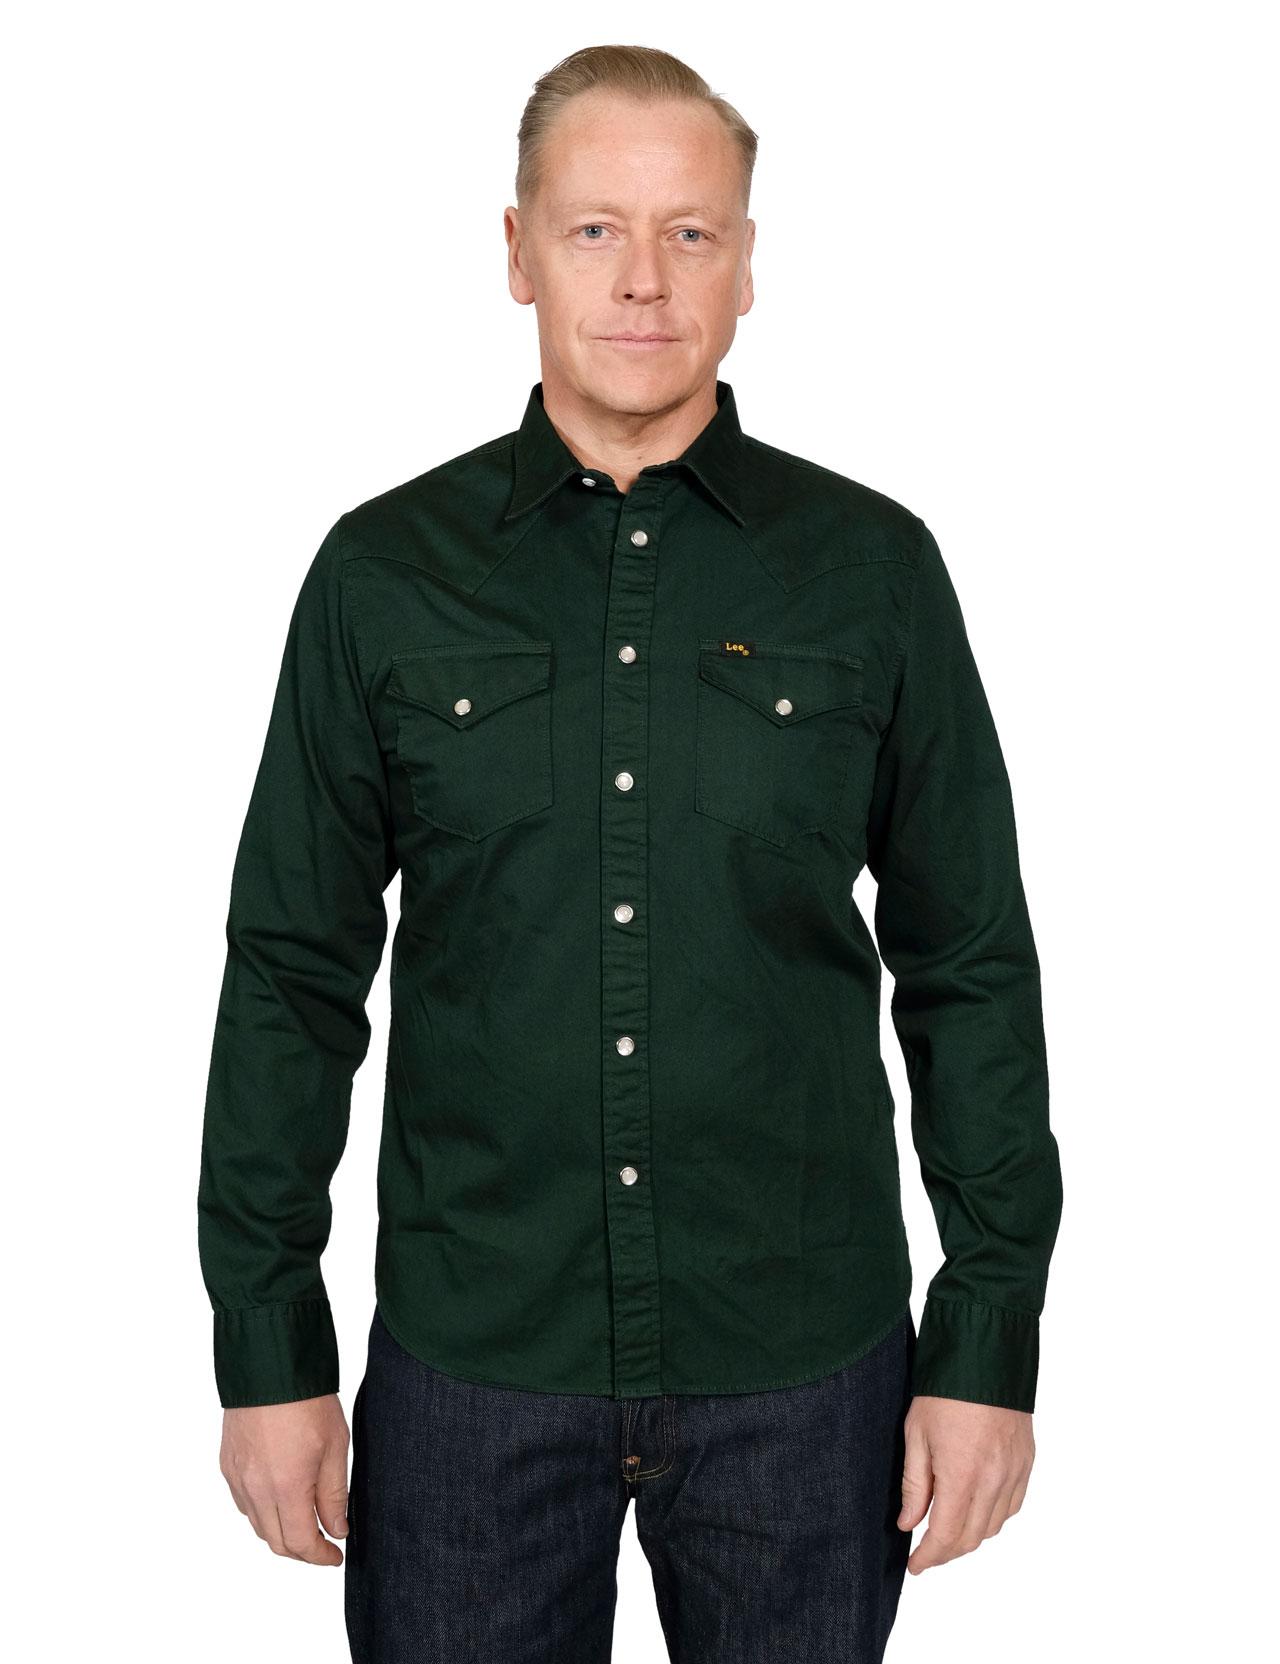 9f8c05a5 Lee - 101 Western Shirt - Bottle Green